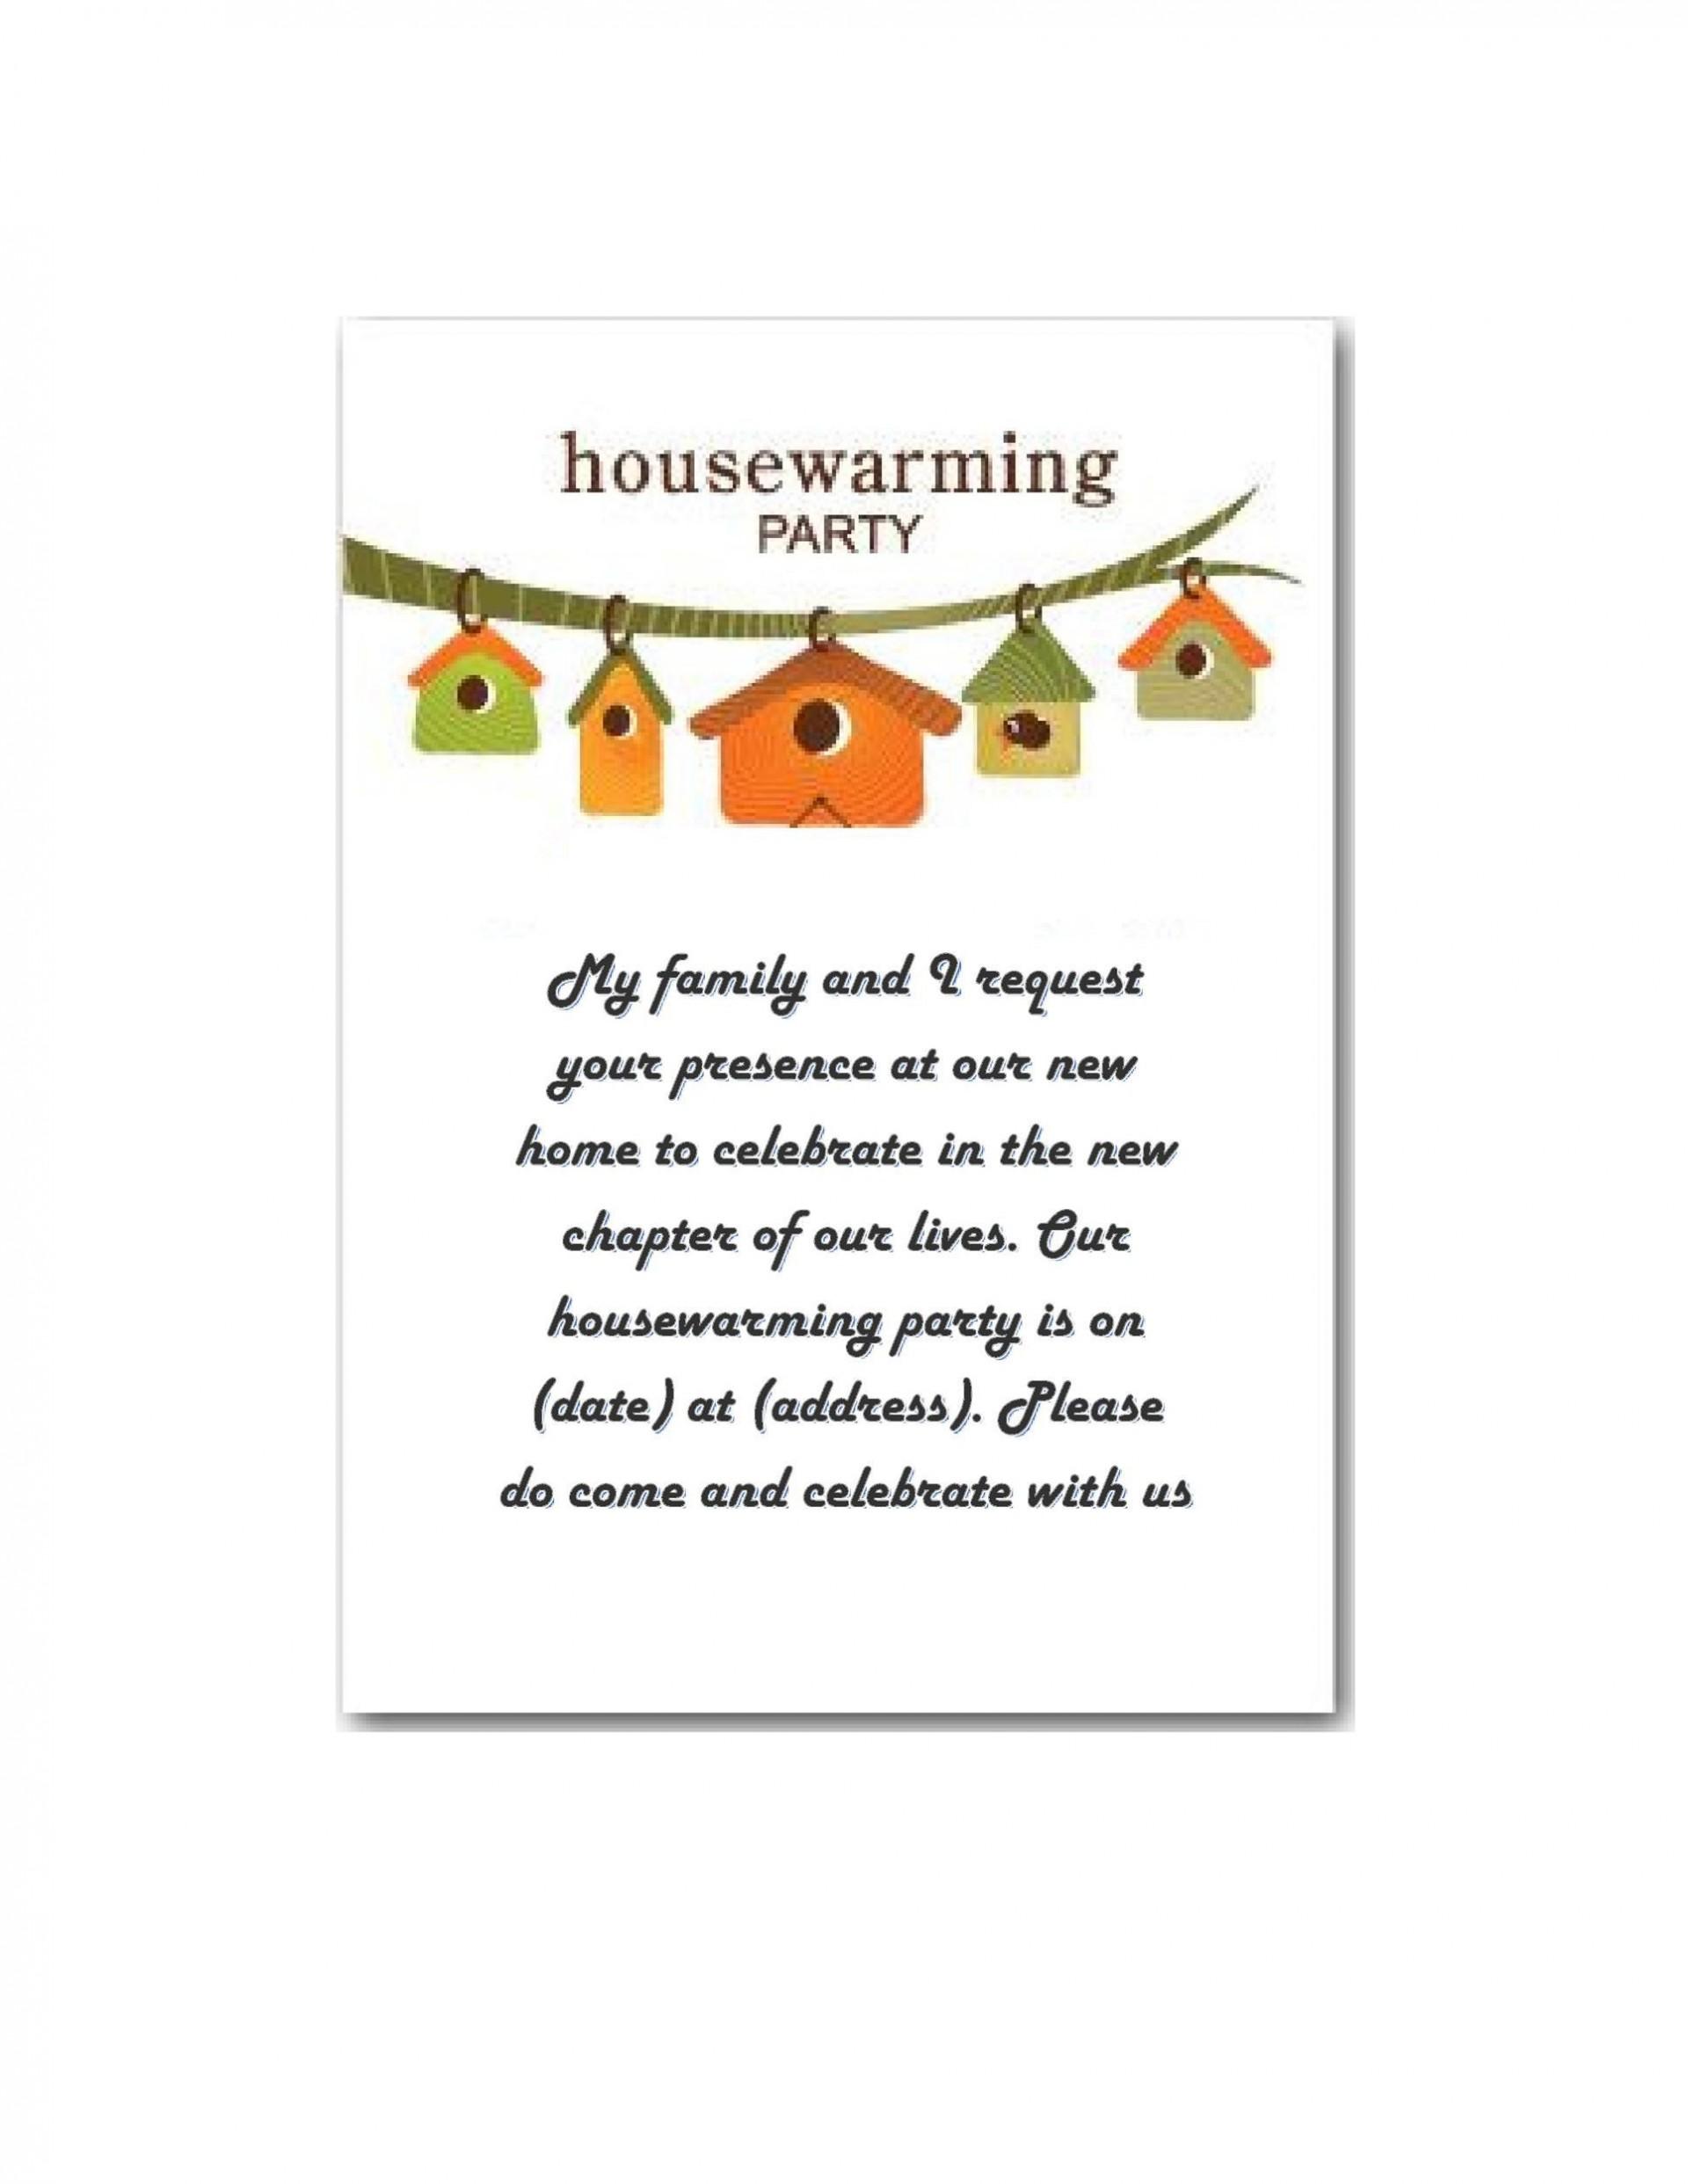 006 Striking Free Housewarming Invitation Template Photo  Templates Printable India Video Download1920